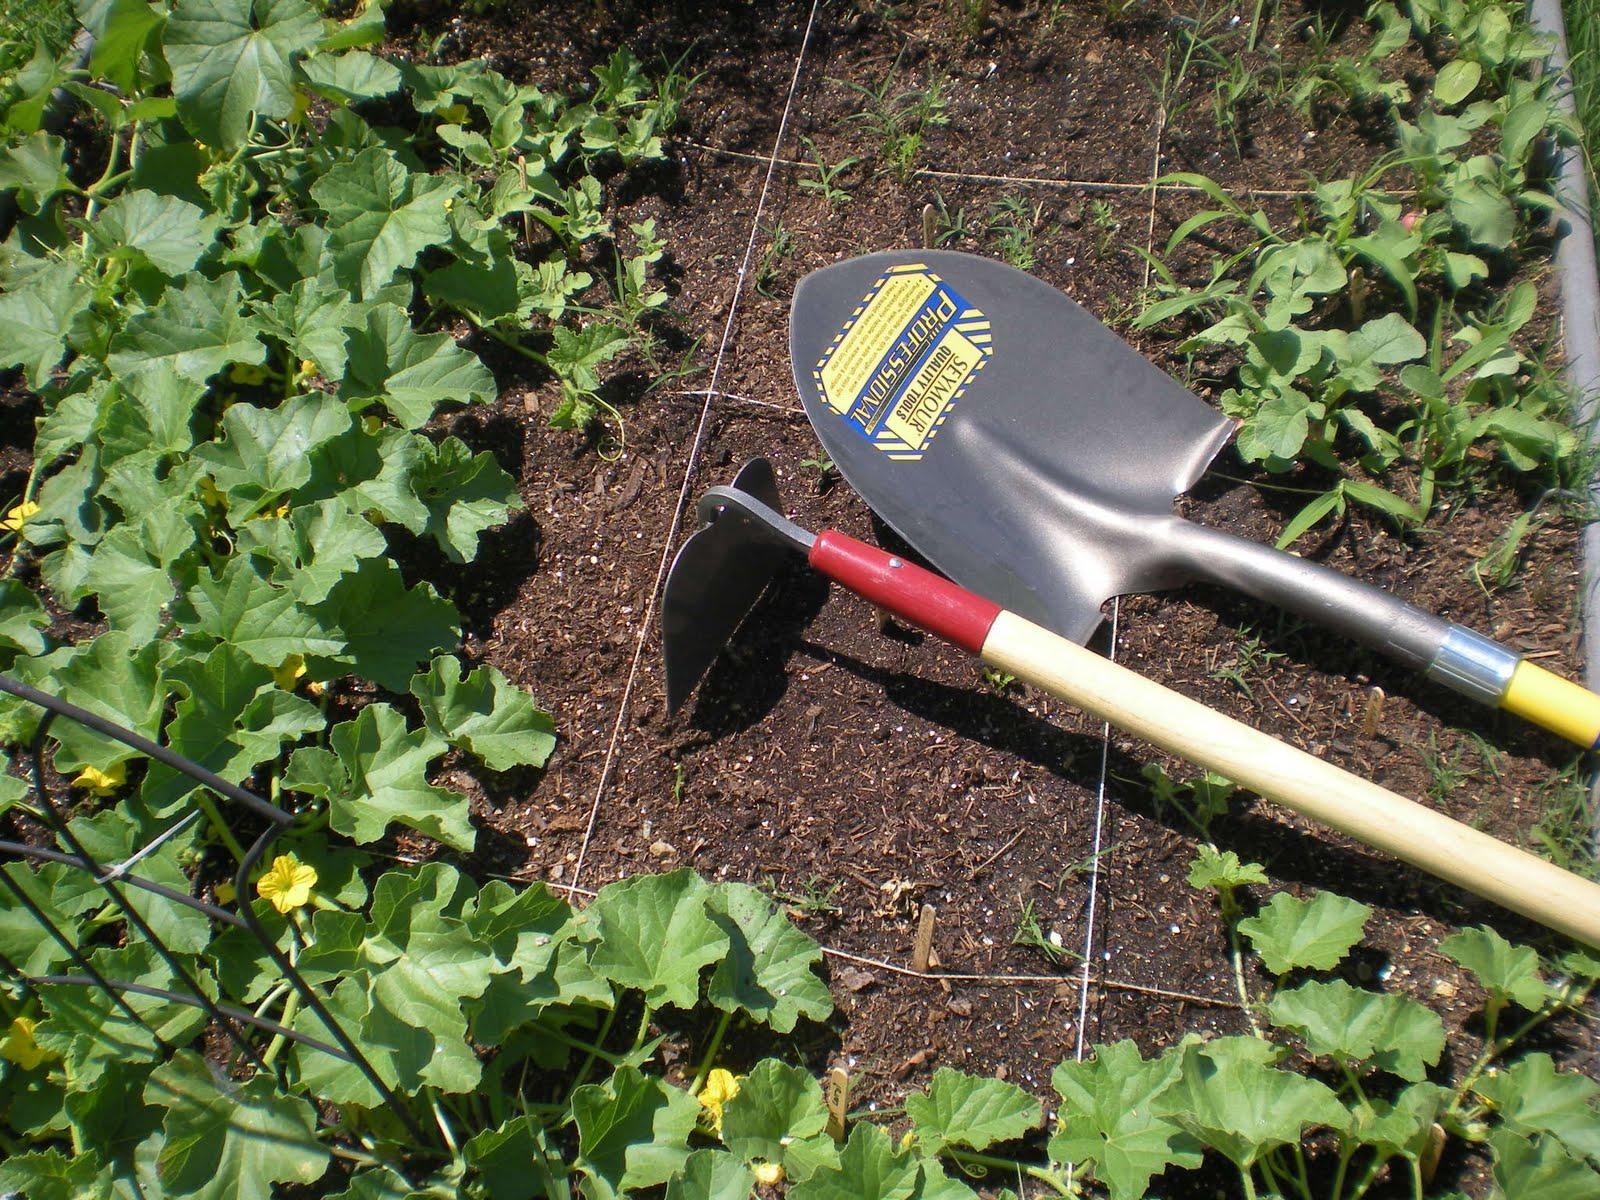 Gotta wanna needa getta prepared got gardening tools for Gardening tools you need